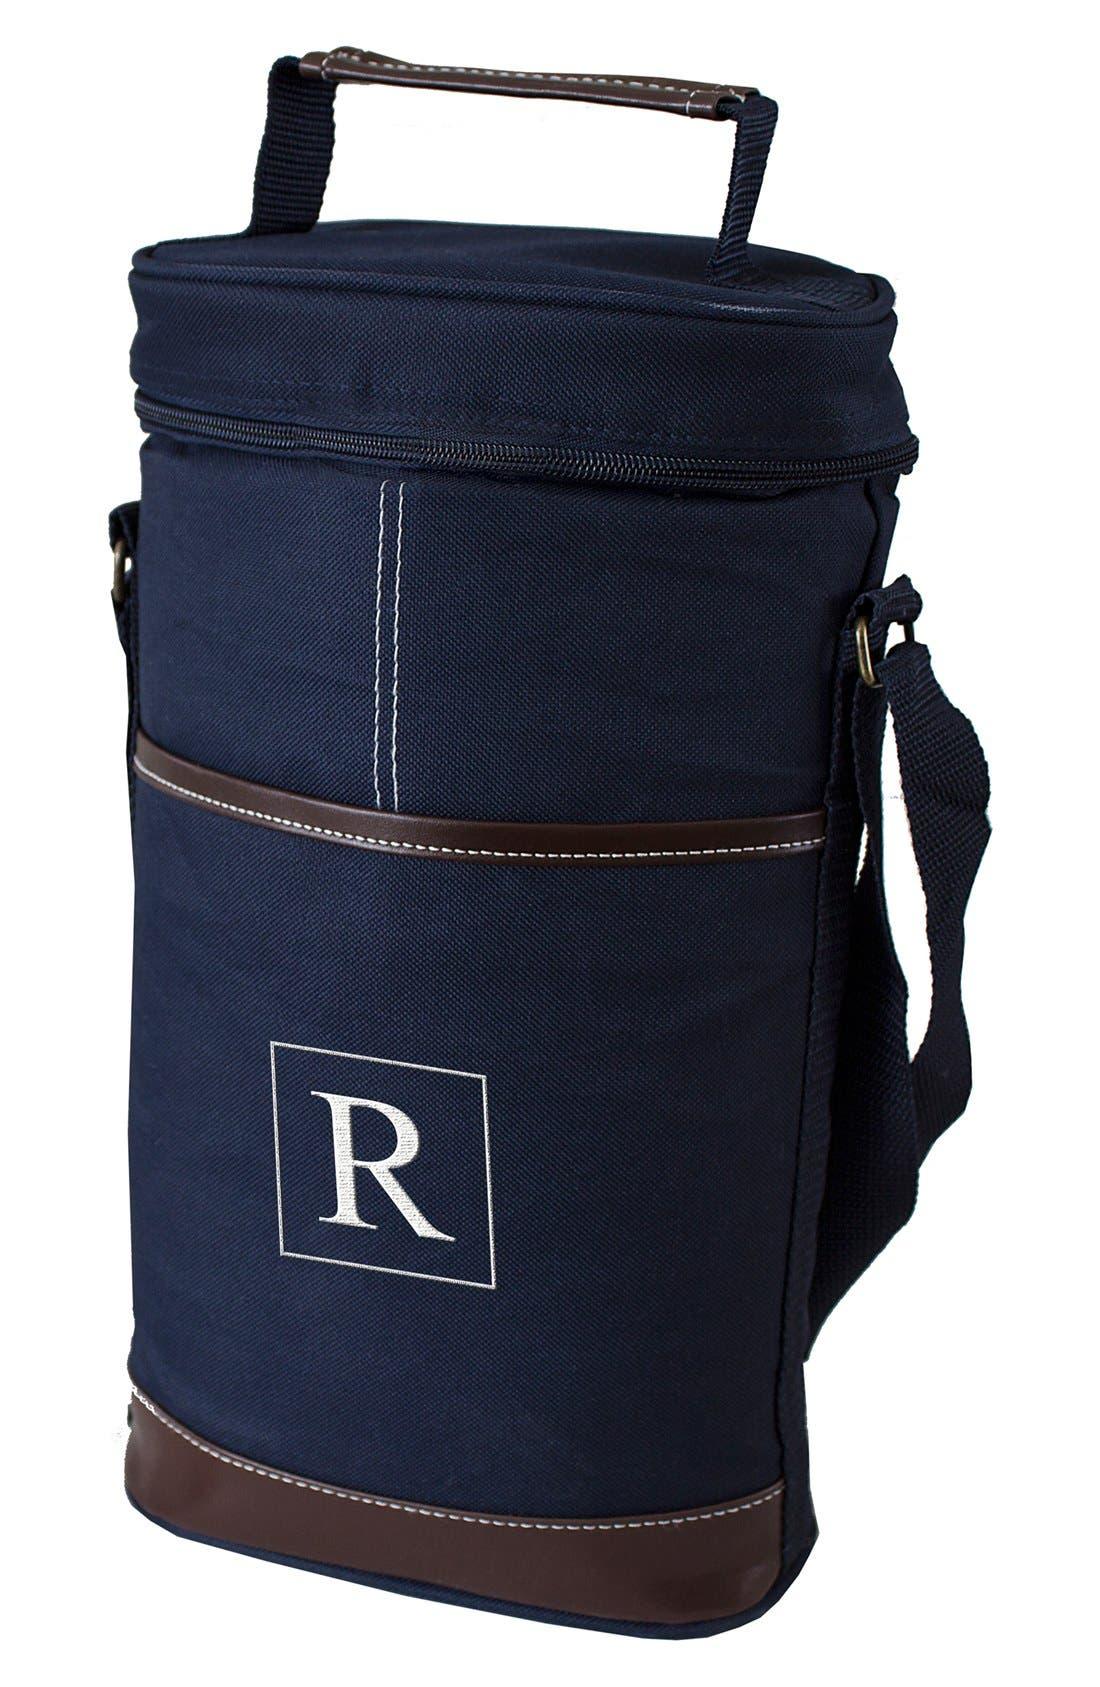 Monogram Wine Cooler,                         Main,                         color, Navy - R